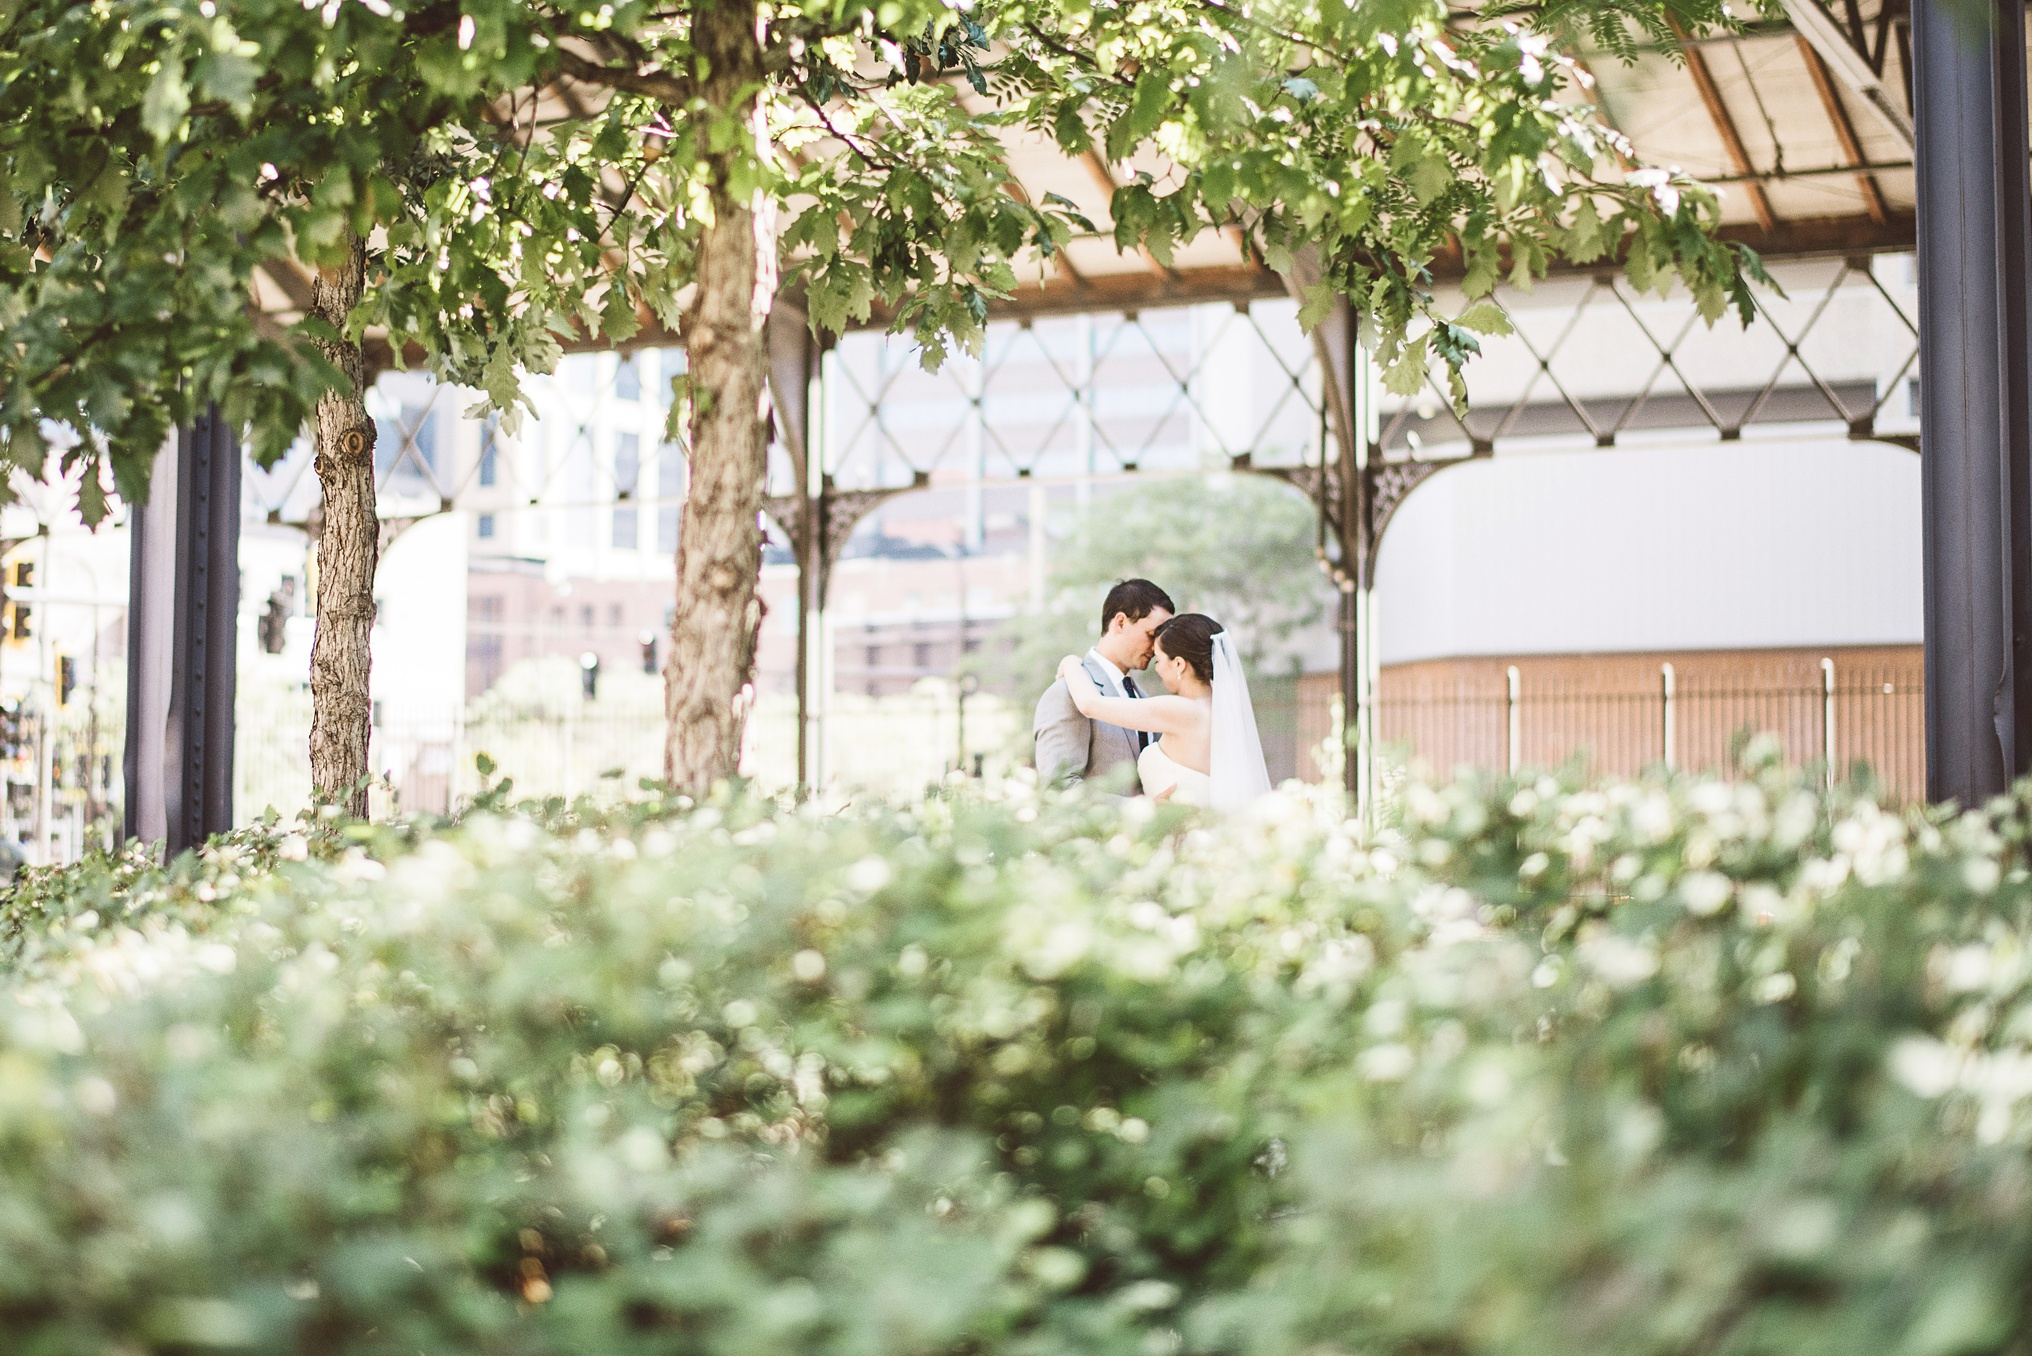 best_wedding_photography_2017_by_lucas_botz_photography_106.jpg